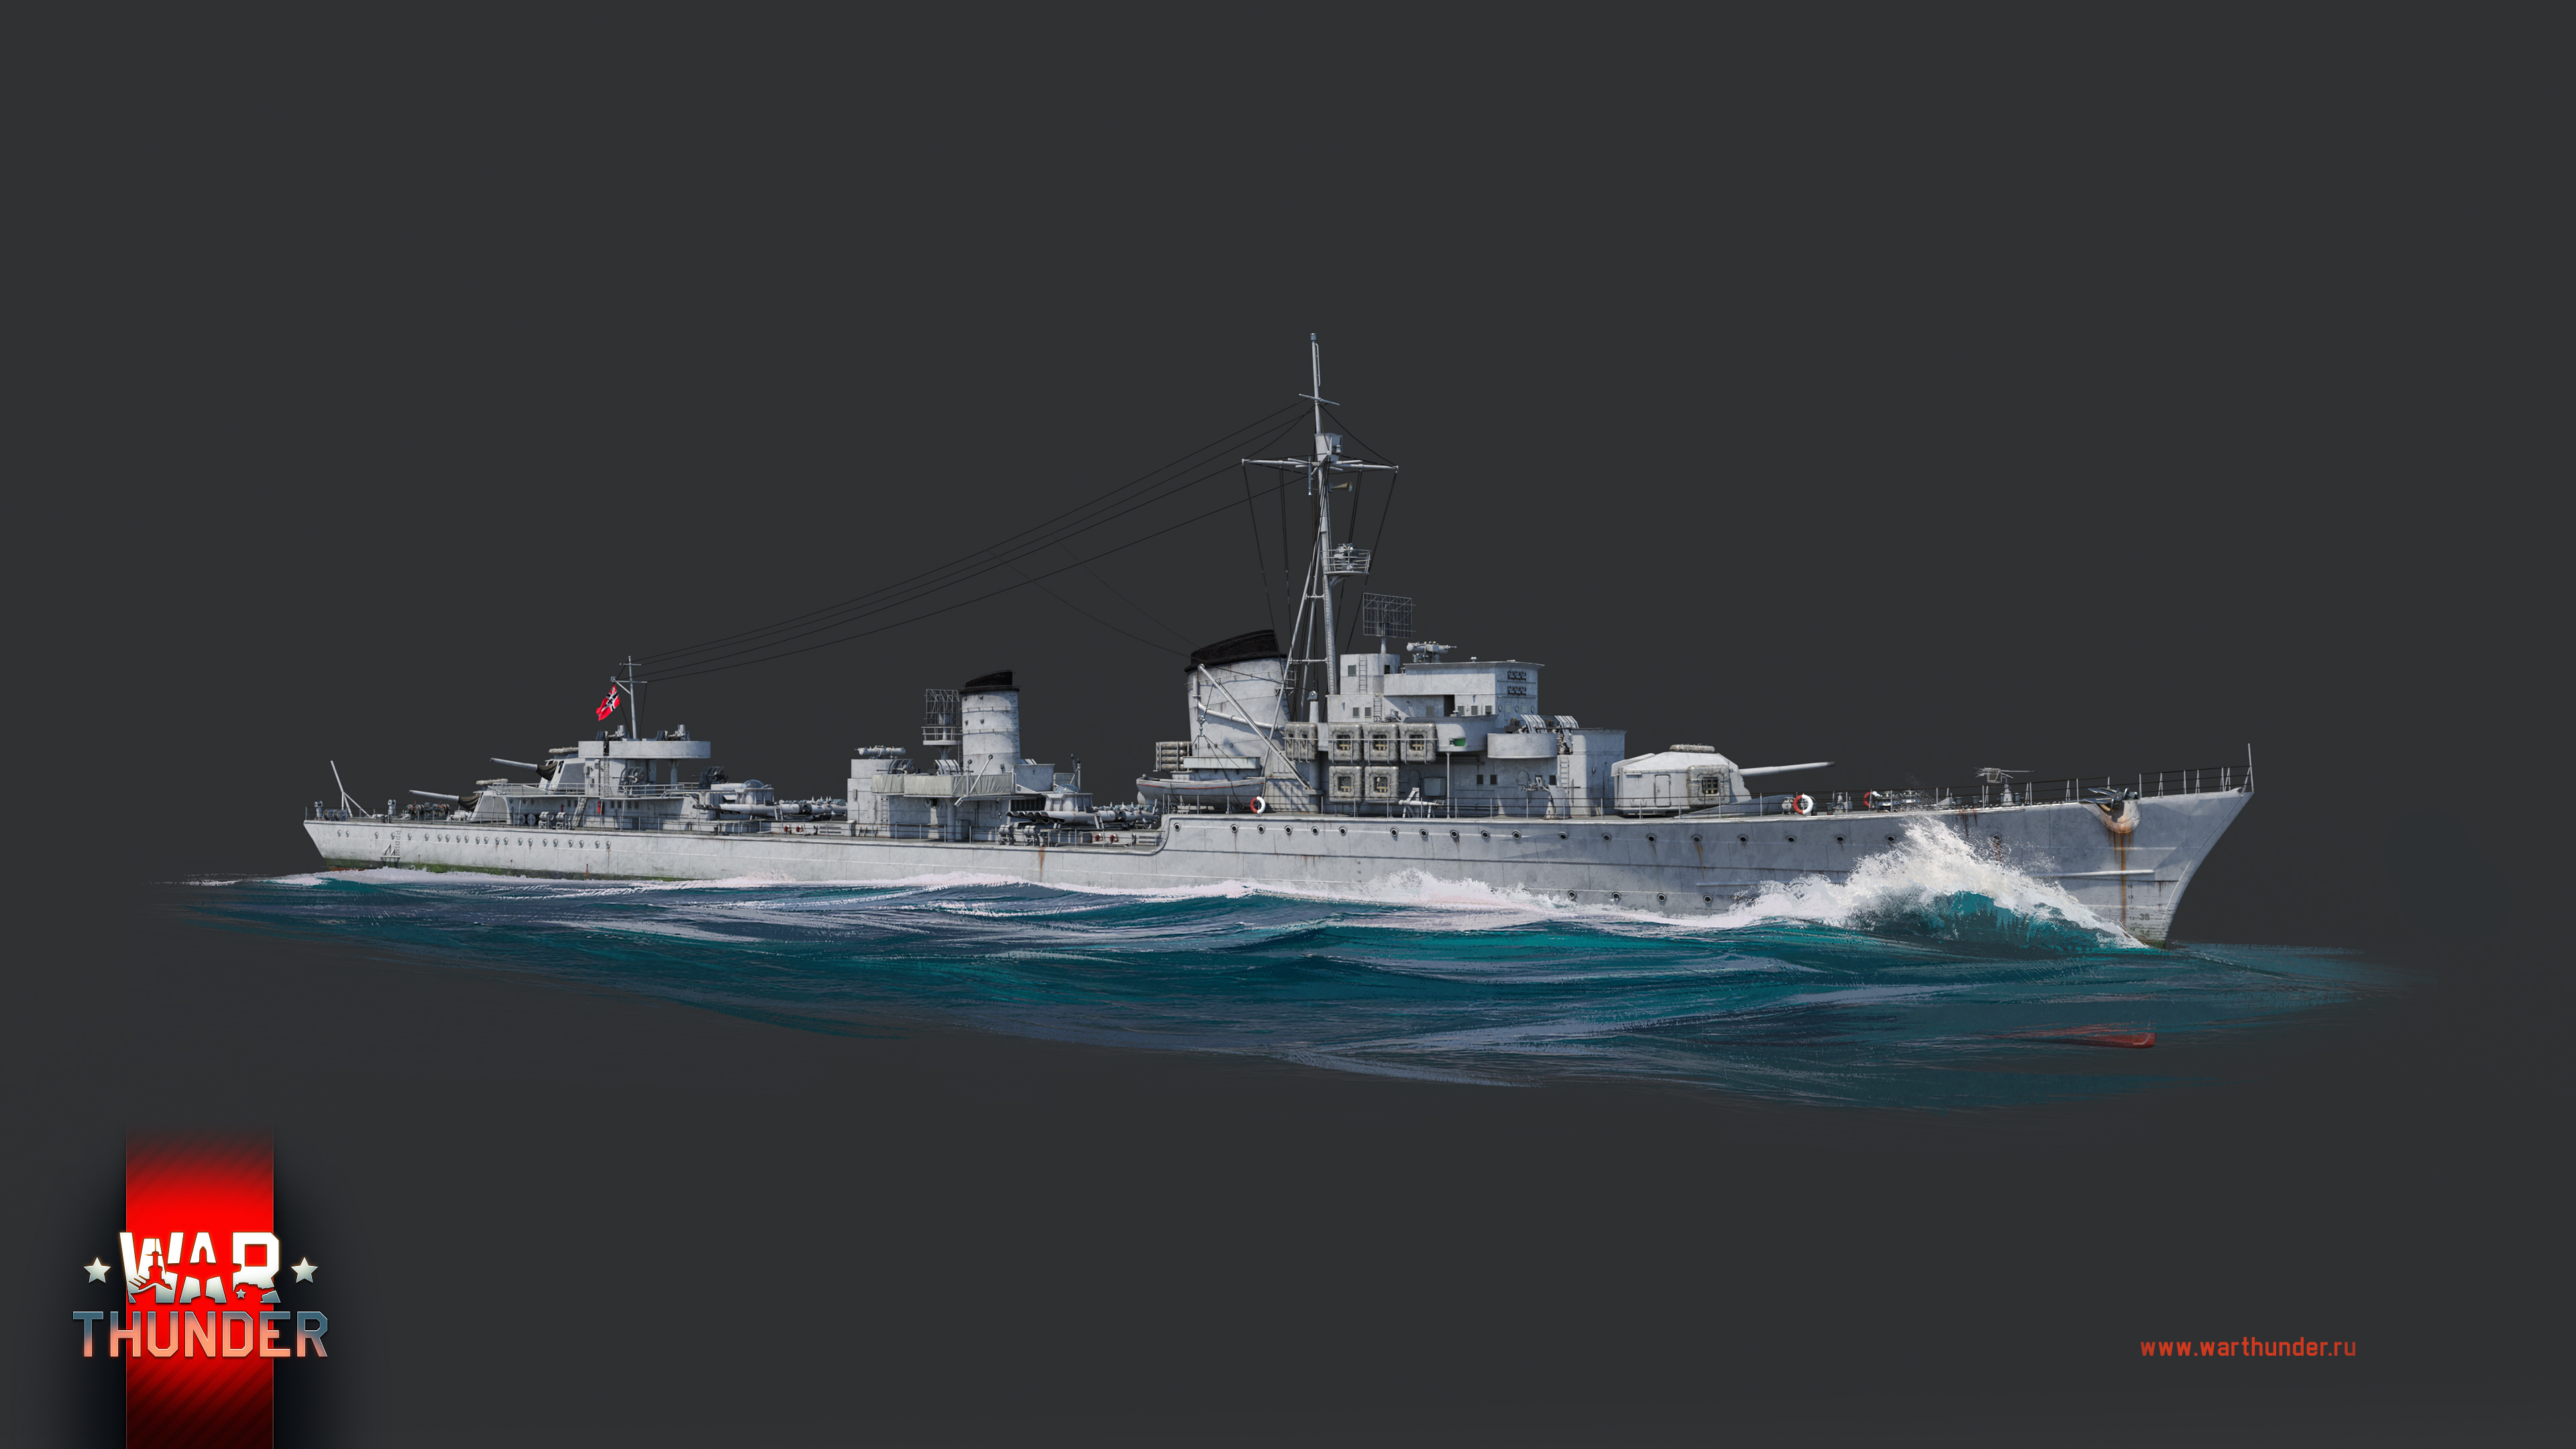 3840x2160_destroyer_class1936a_z25_wave_